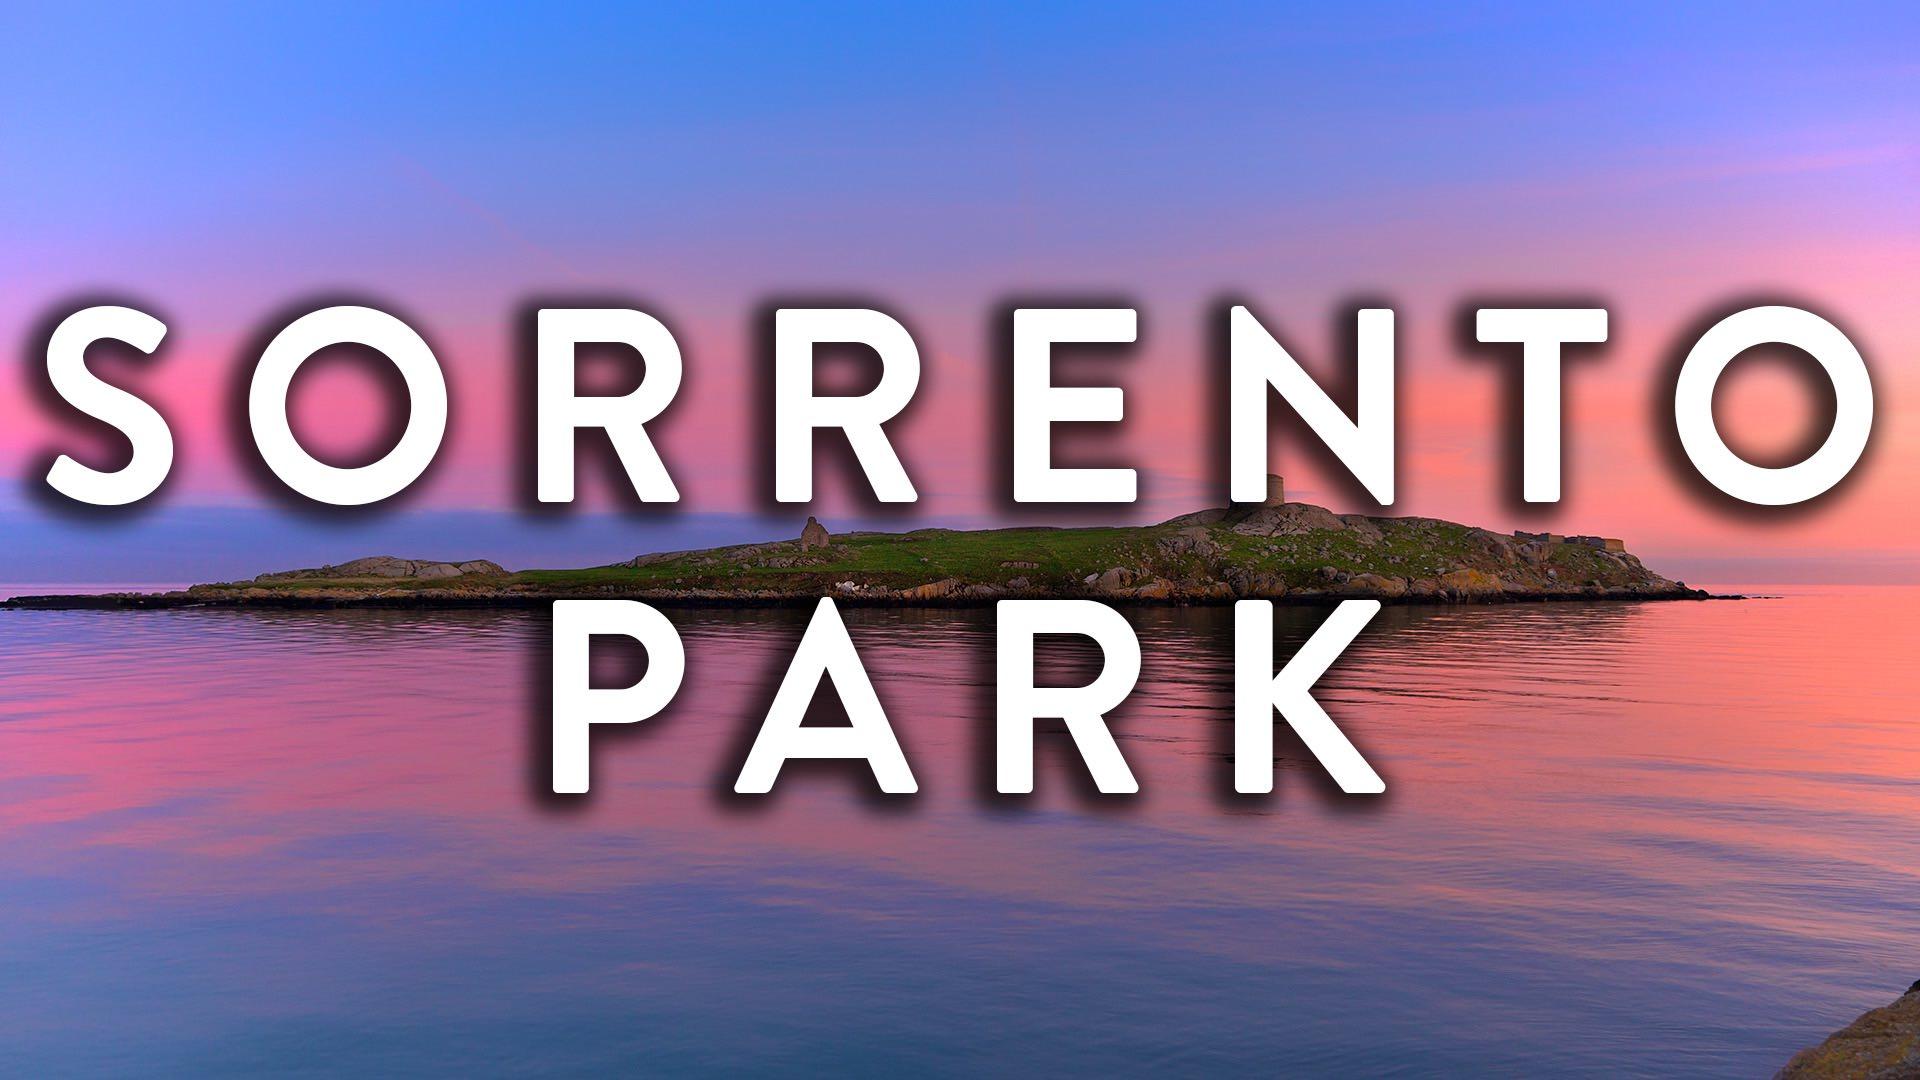 Sorrento Park